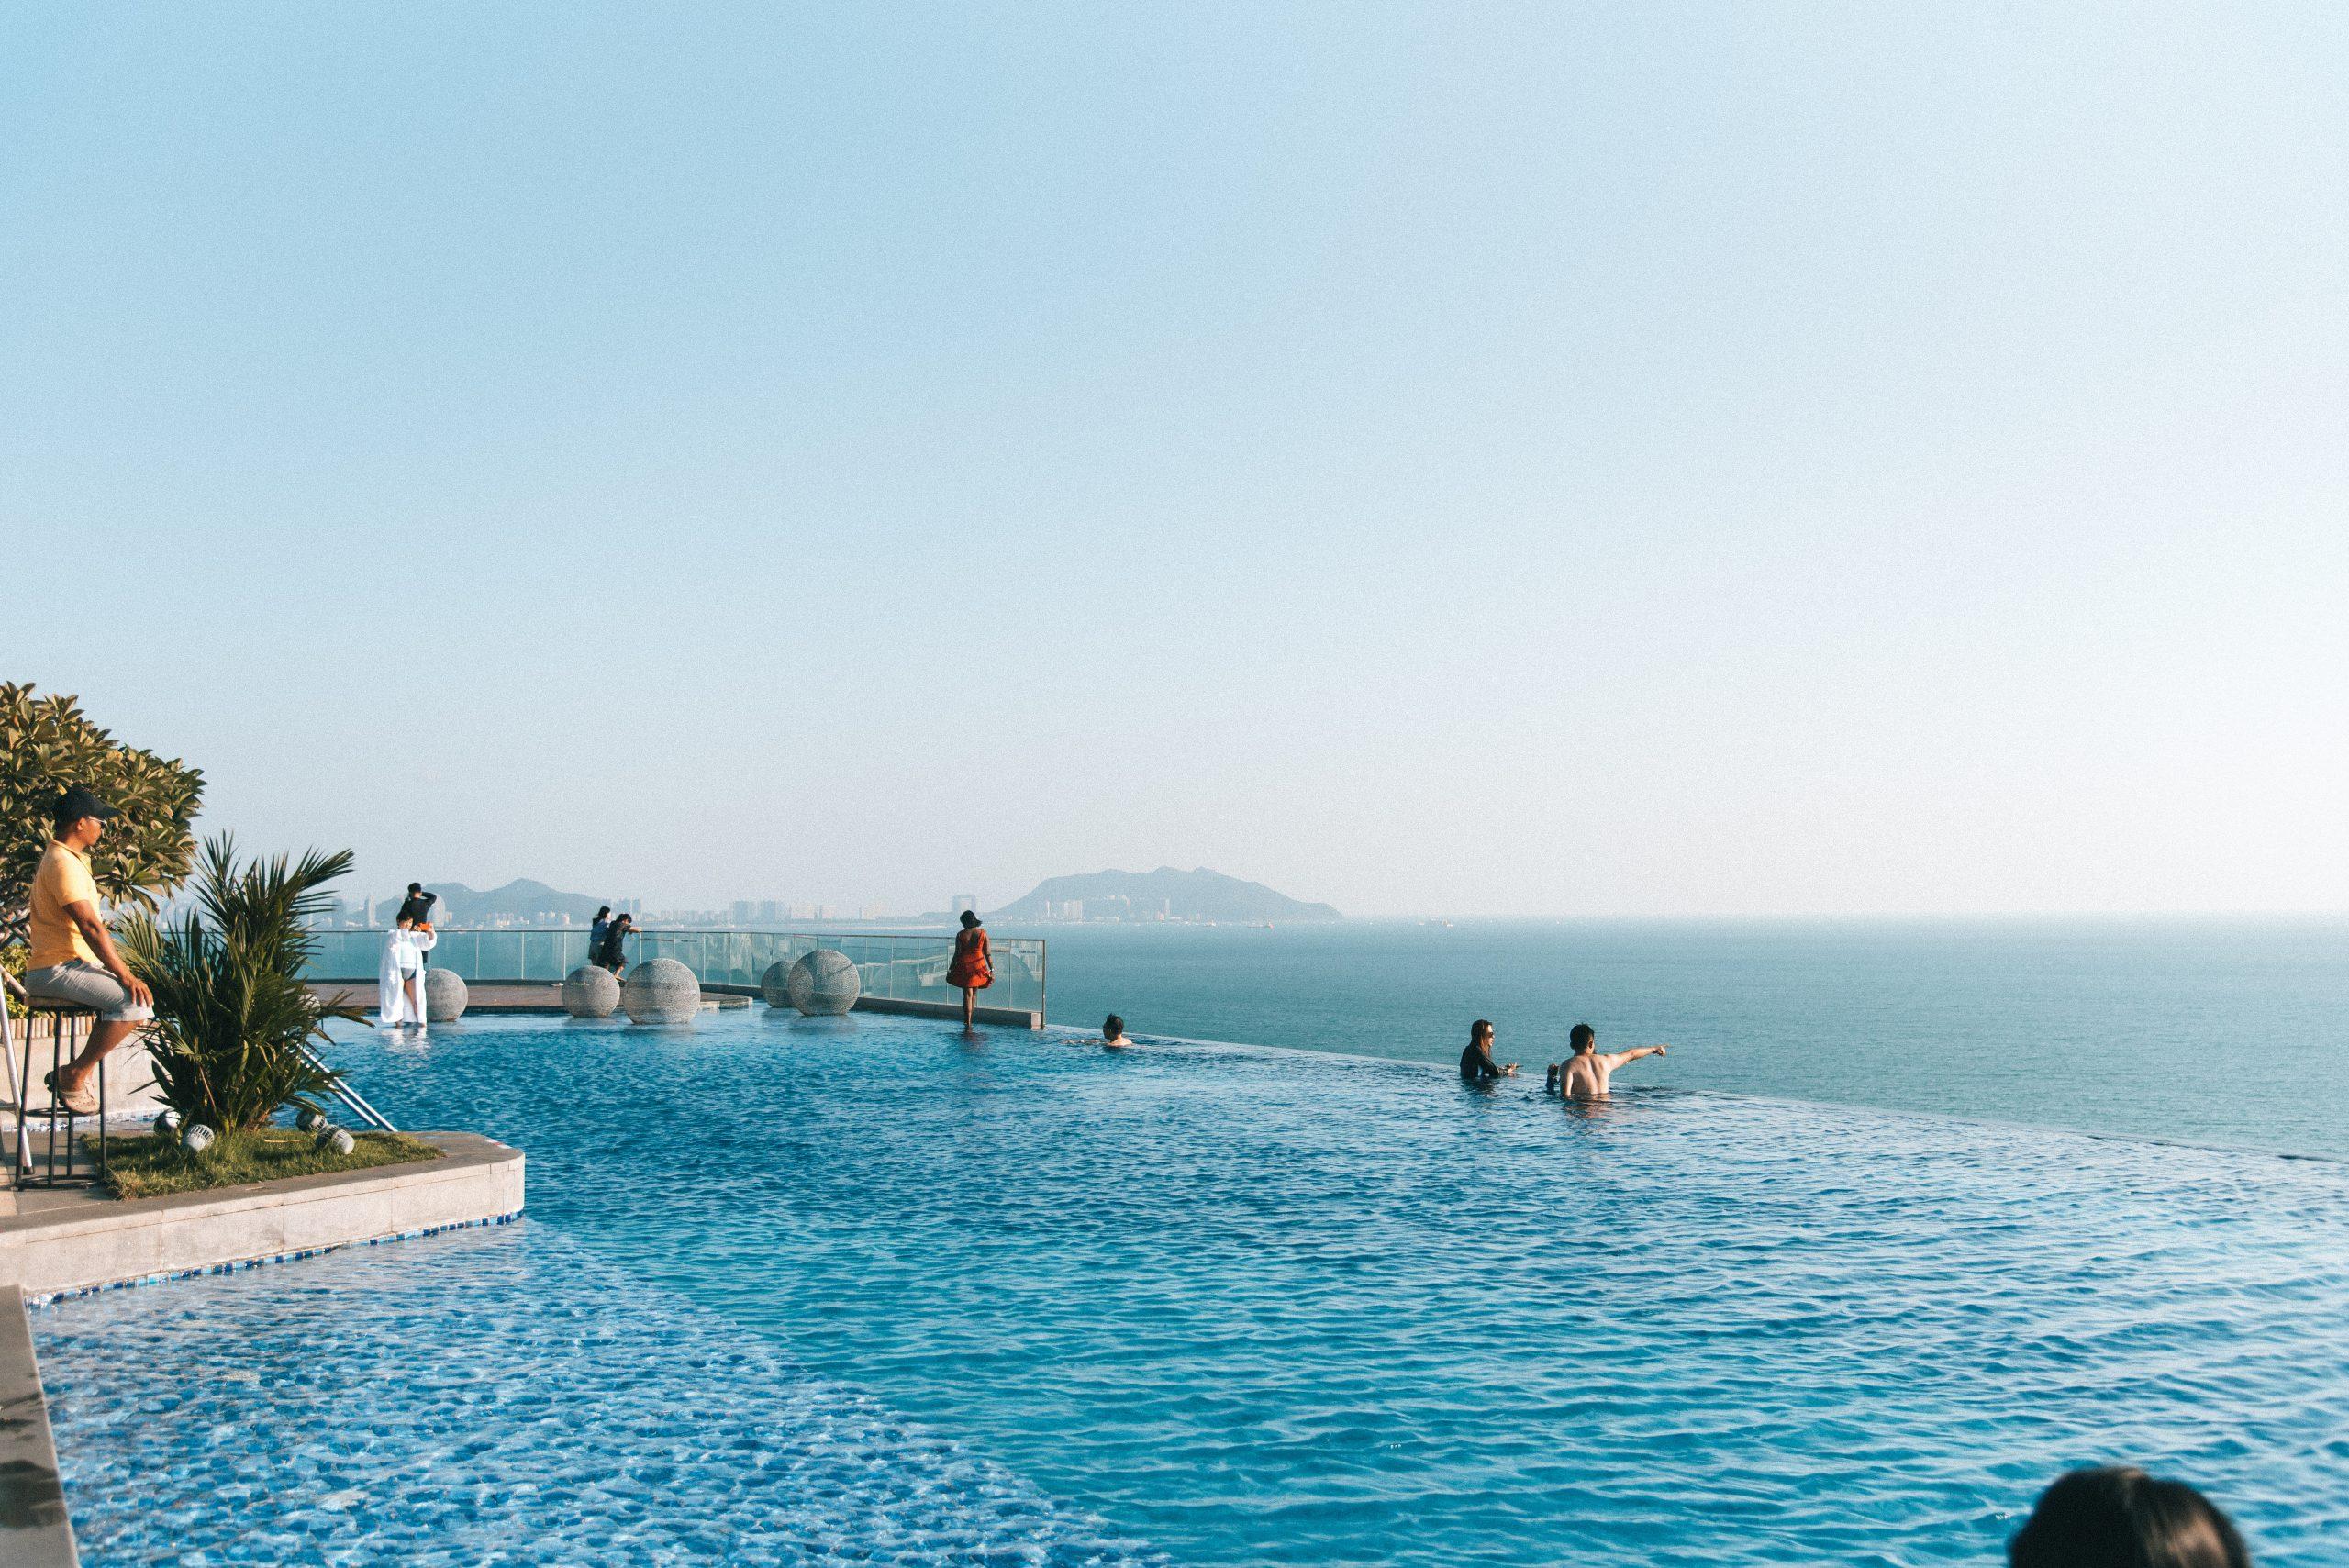 things to do in Sanya, Sanya travel guide, infinity pool in Sanya, Conifer Resort in Sanya,